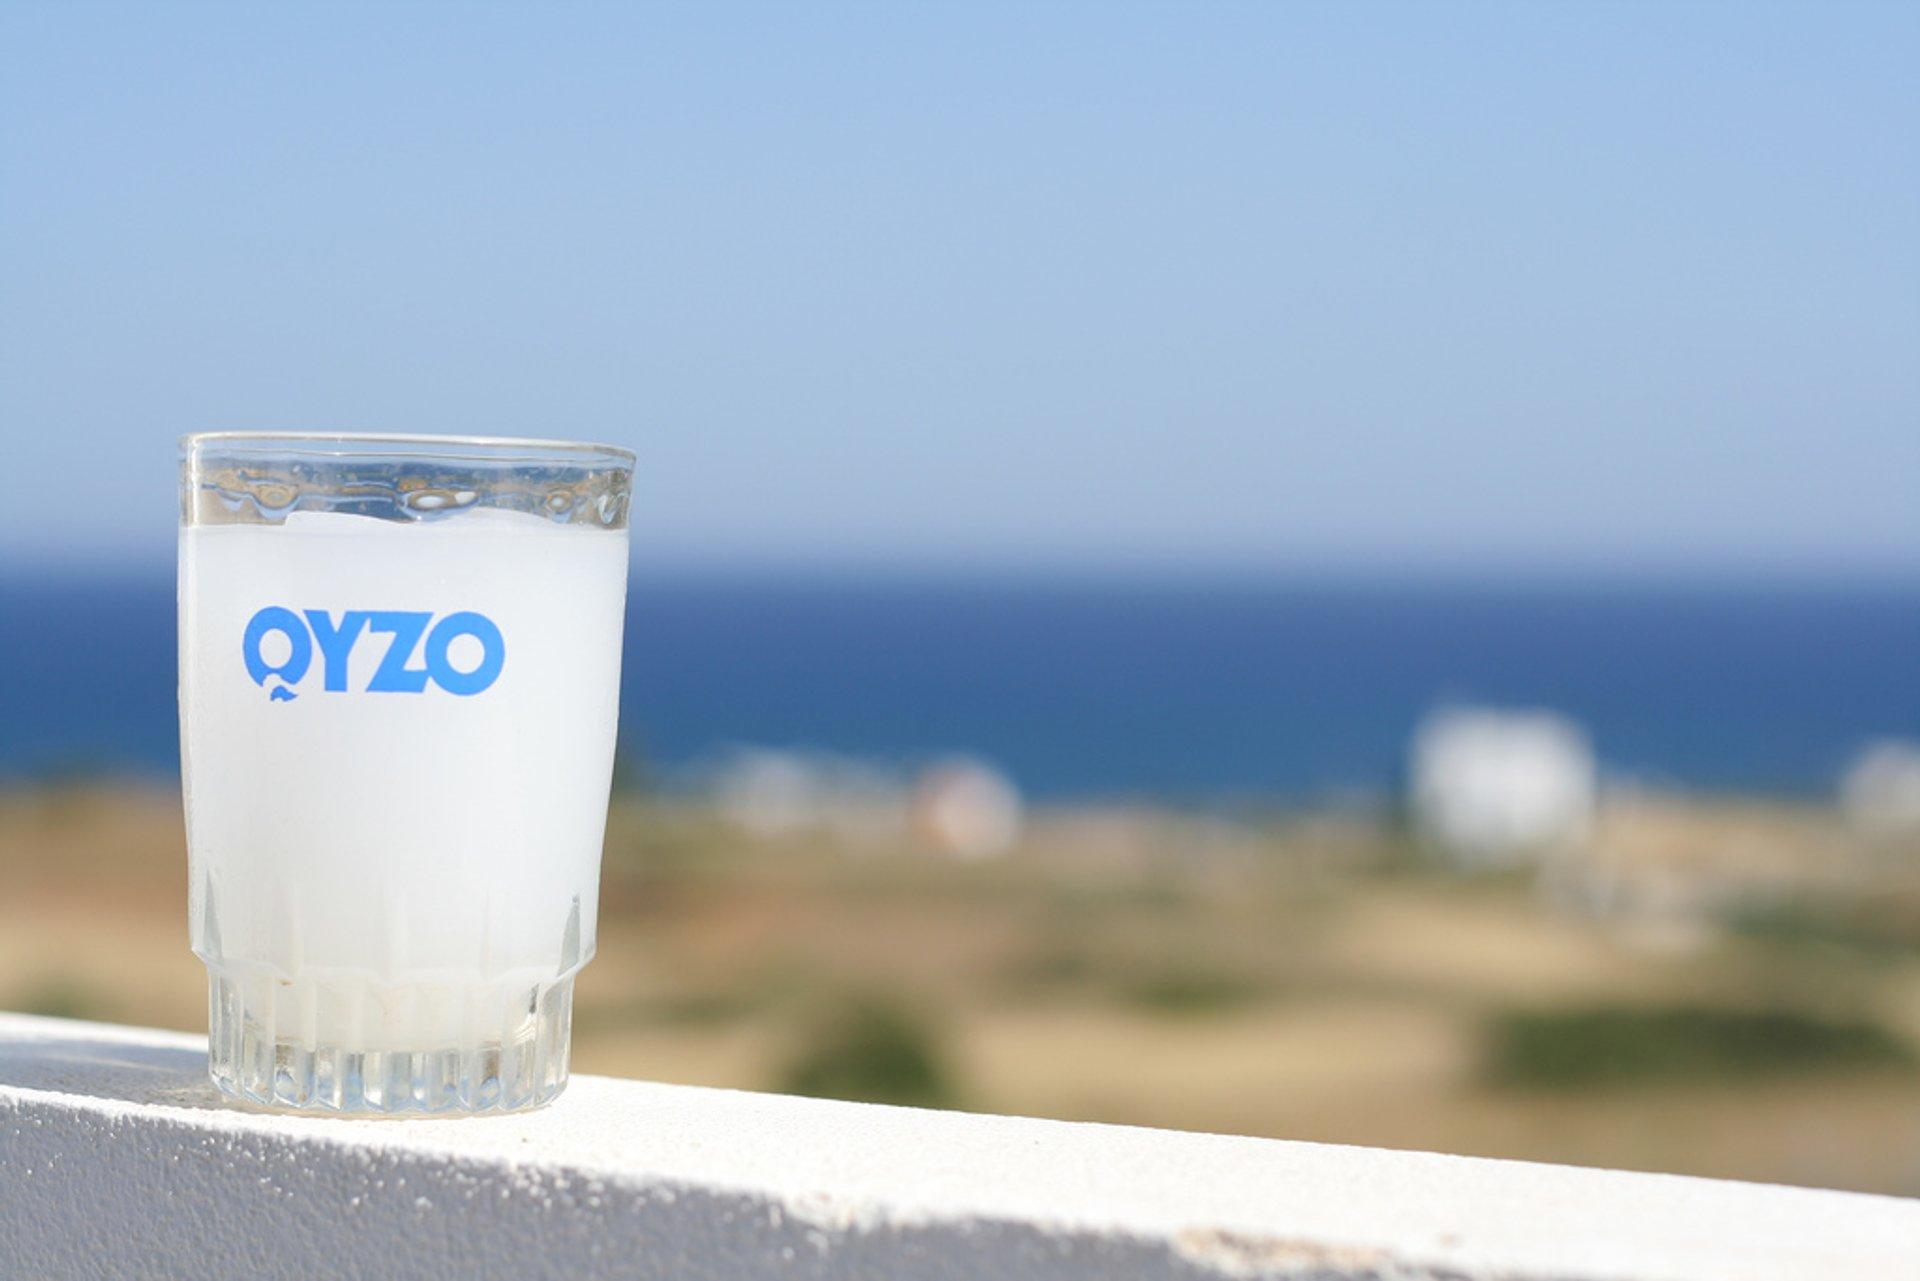 Ouzo & Tsipouro Preparation in Greece - Best Season 2020